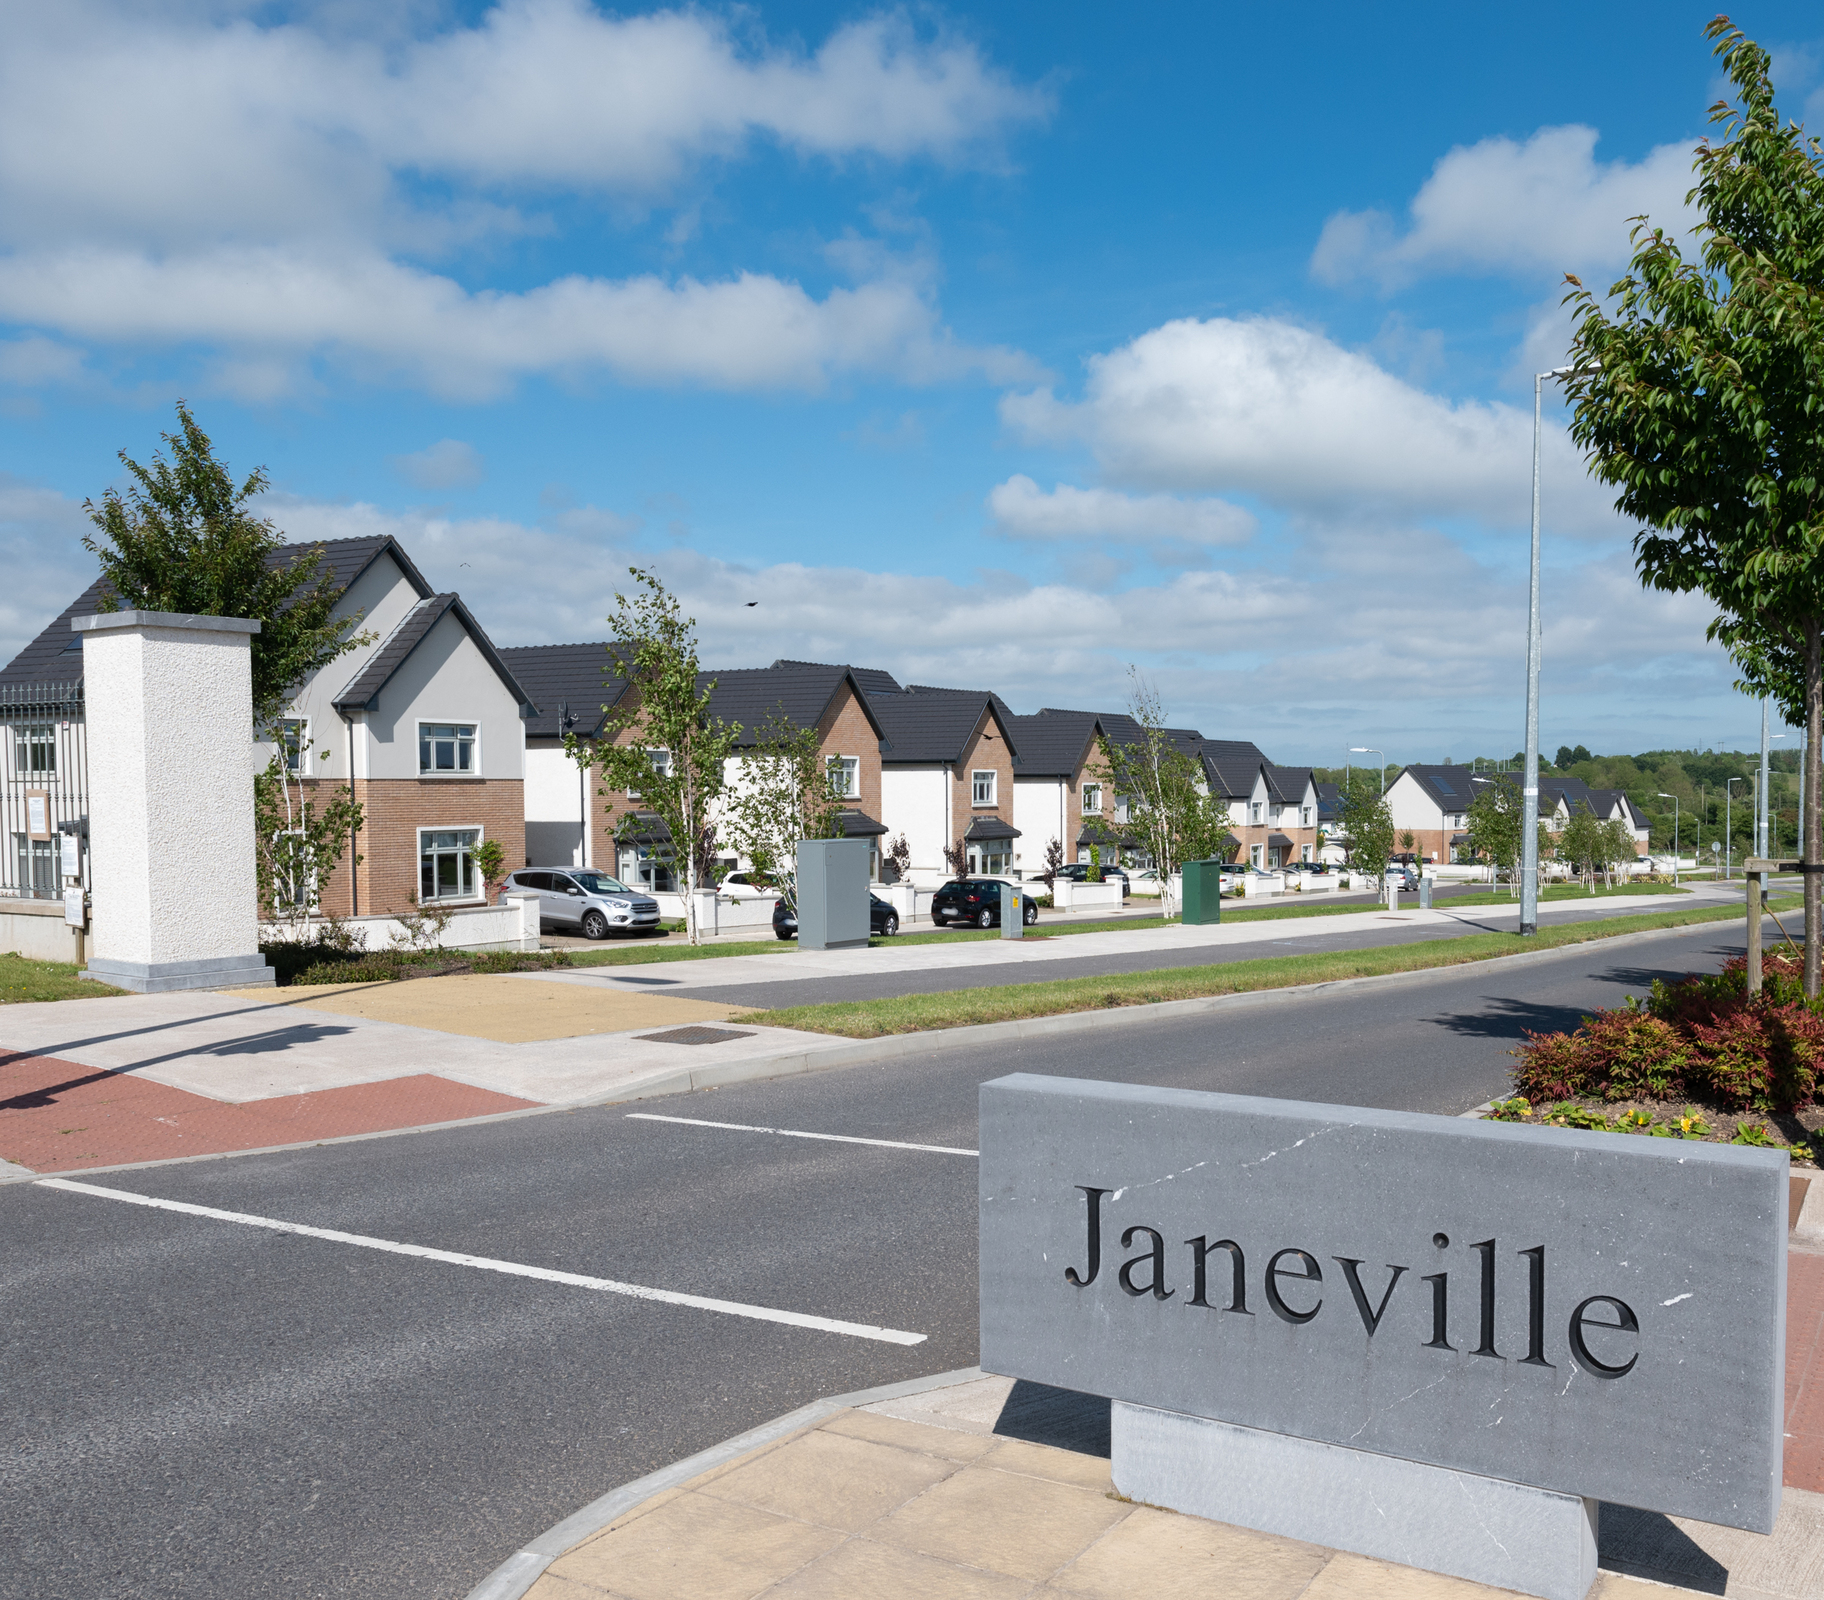 B2 House Type, 'Janeville', Carrigaline, Co. Cork